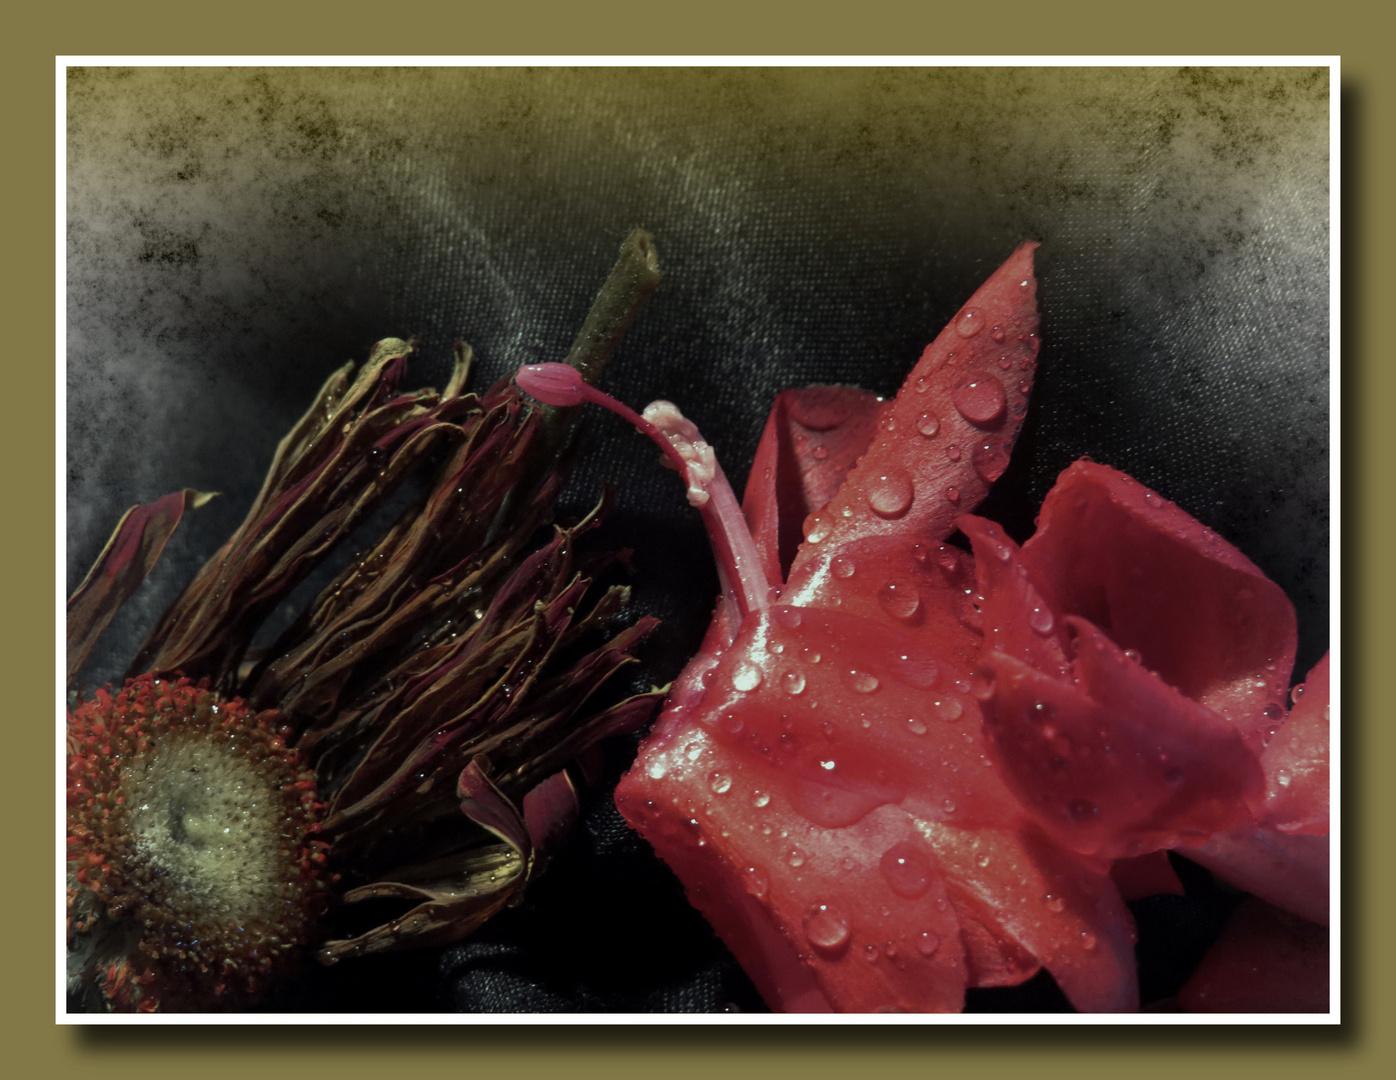 verstorbene Gerbera neben Kaktusblüte